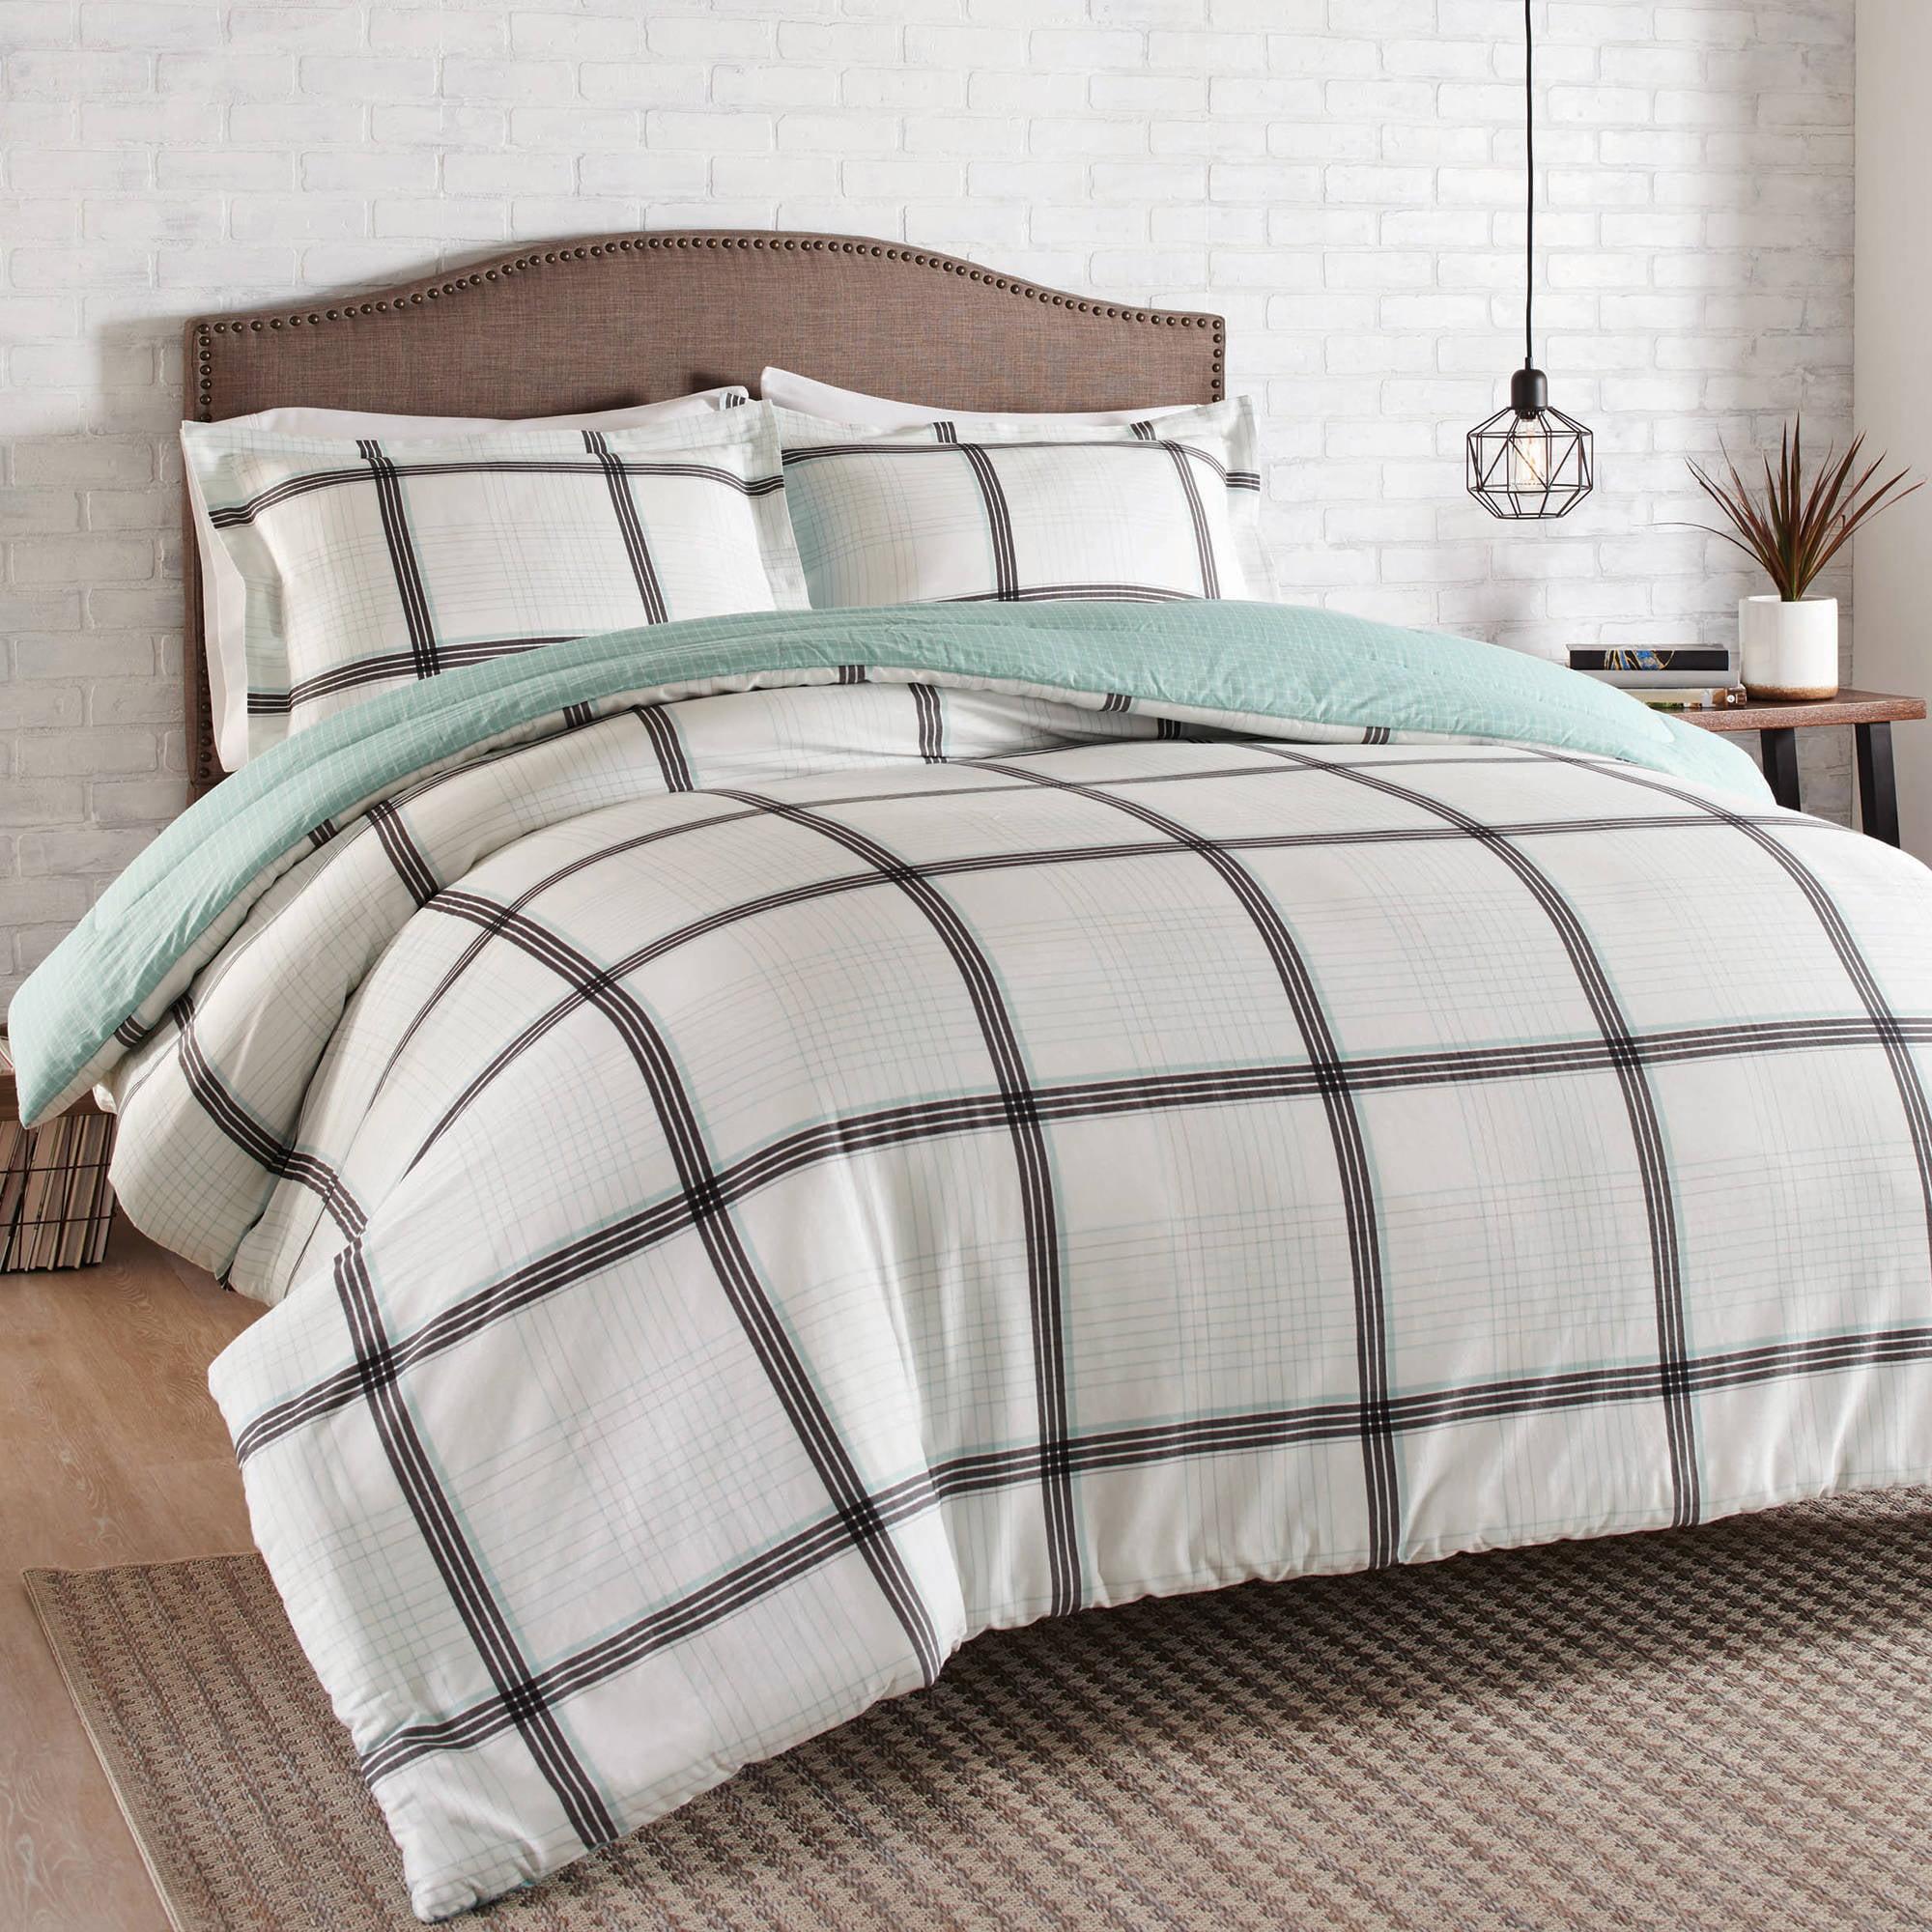 Better Homes and Gardens 3-Piece Modern Plaid Comforter Set